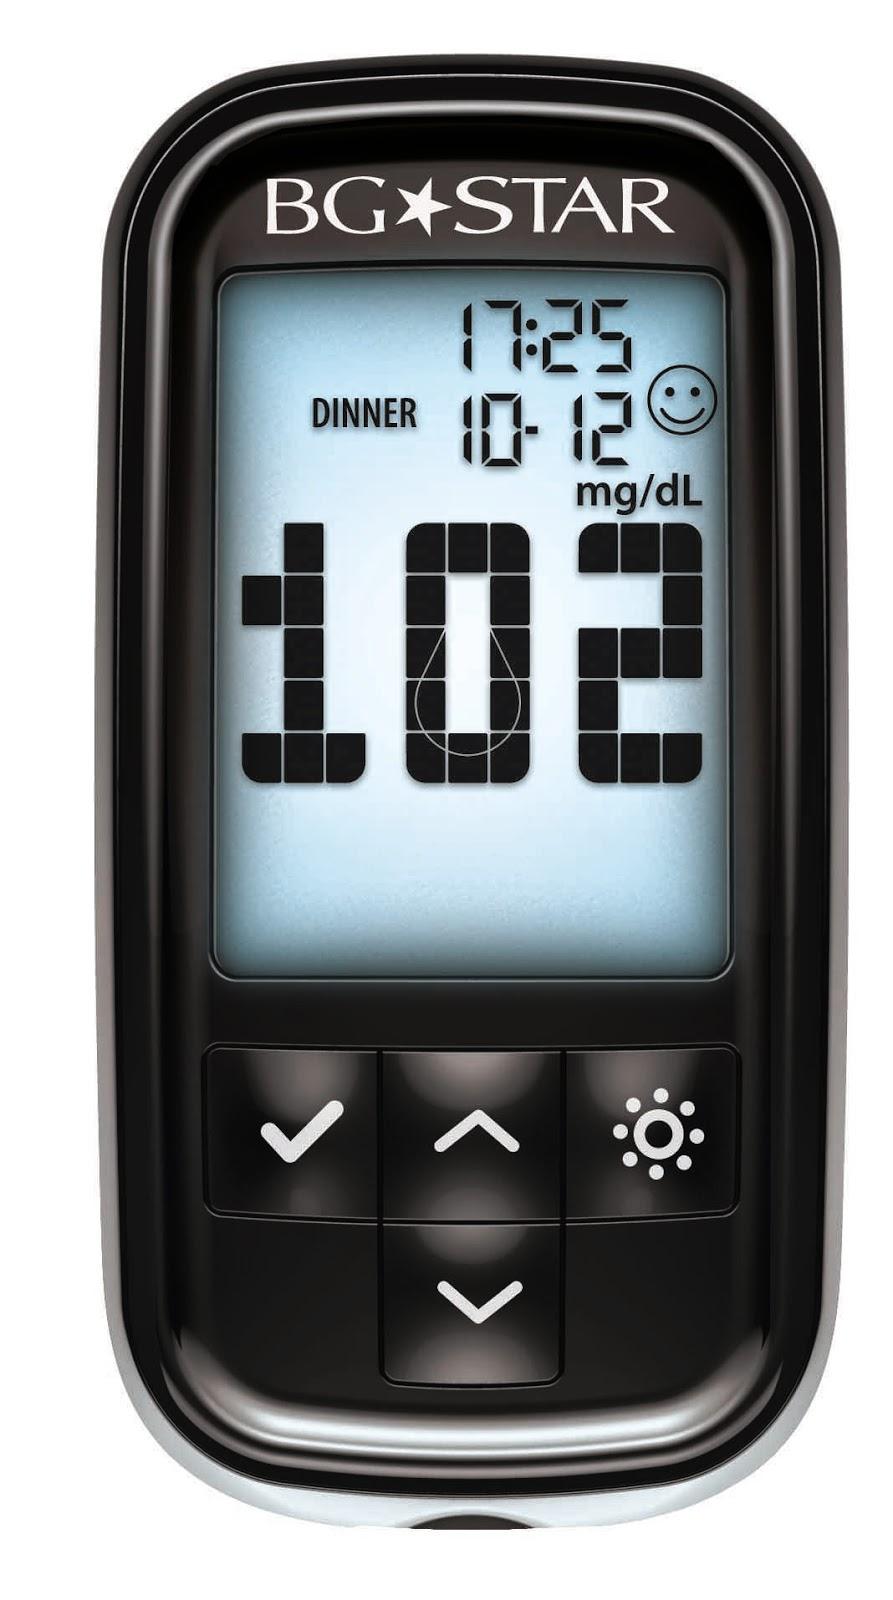 aparelho, medição, glicemia, bg star, sanofi, diabetes